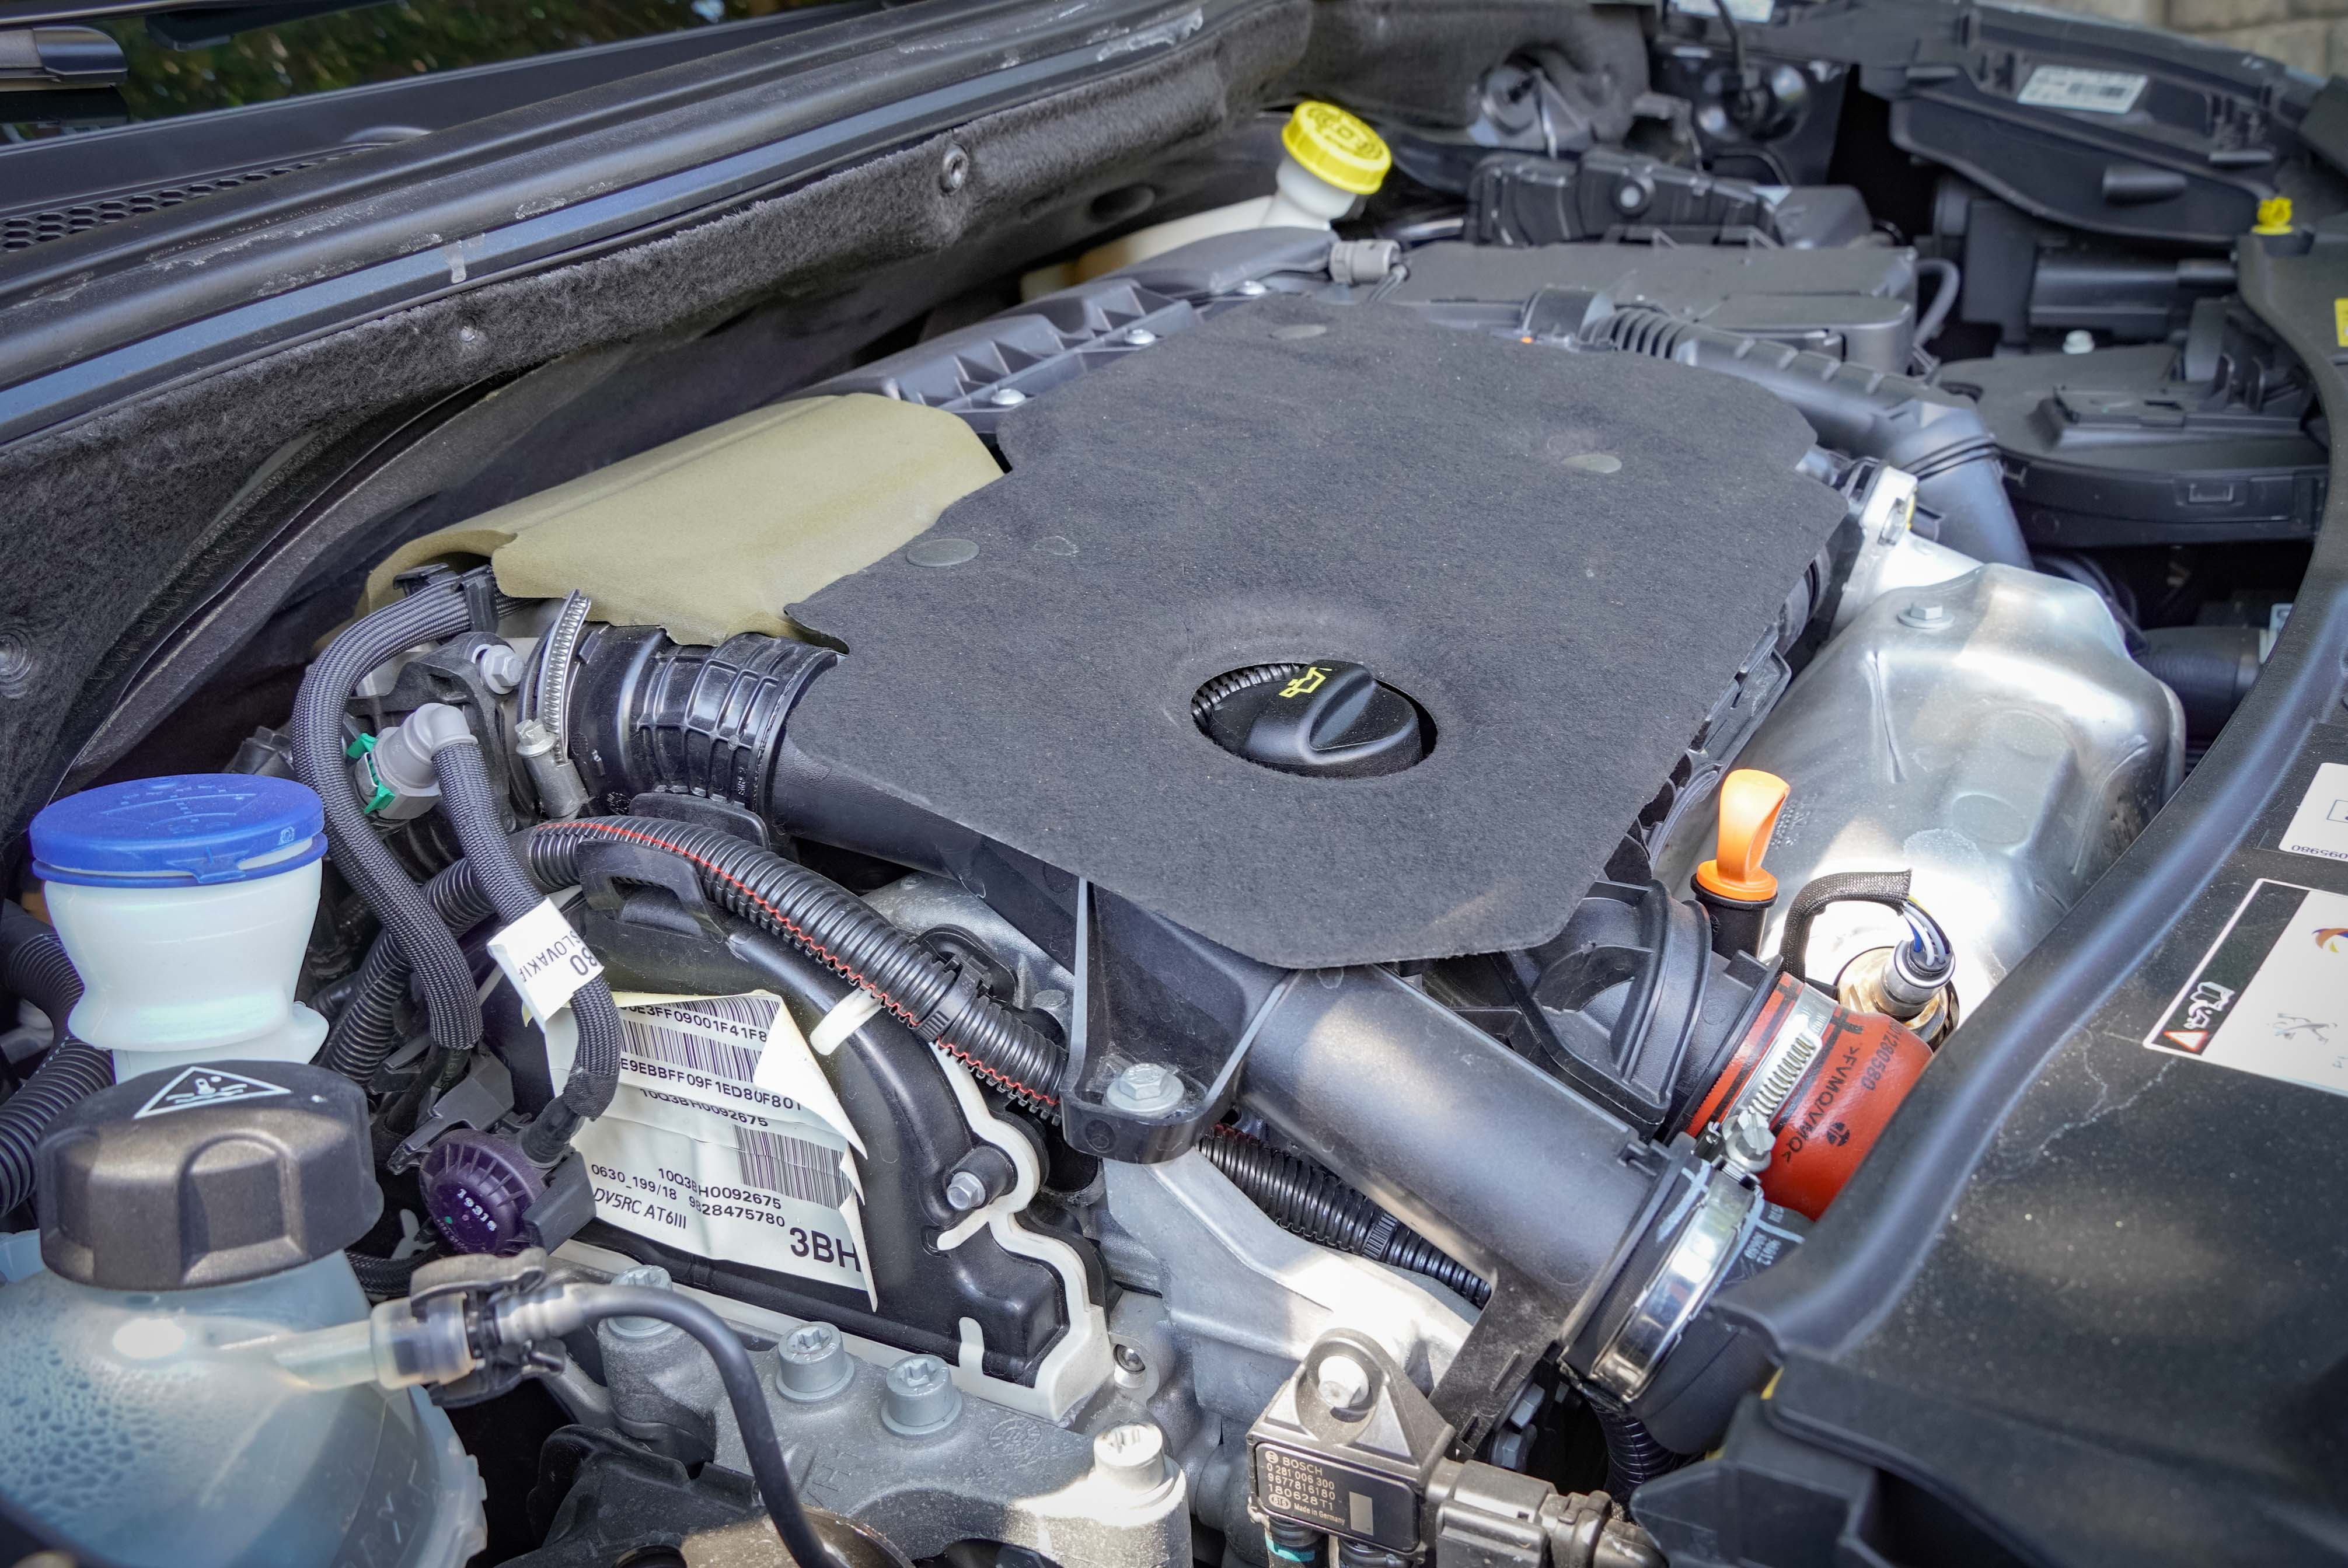 1.5L BlueHDi 特仕版採用 PSA 集團全新 DV5RC 直列橫置四缸渦輪增壓柴油引擎。